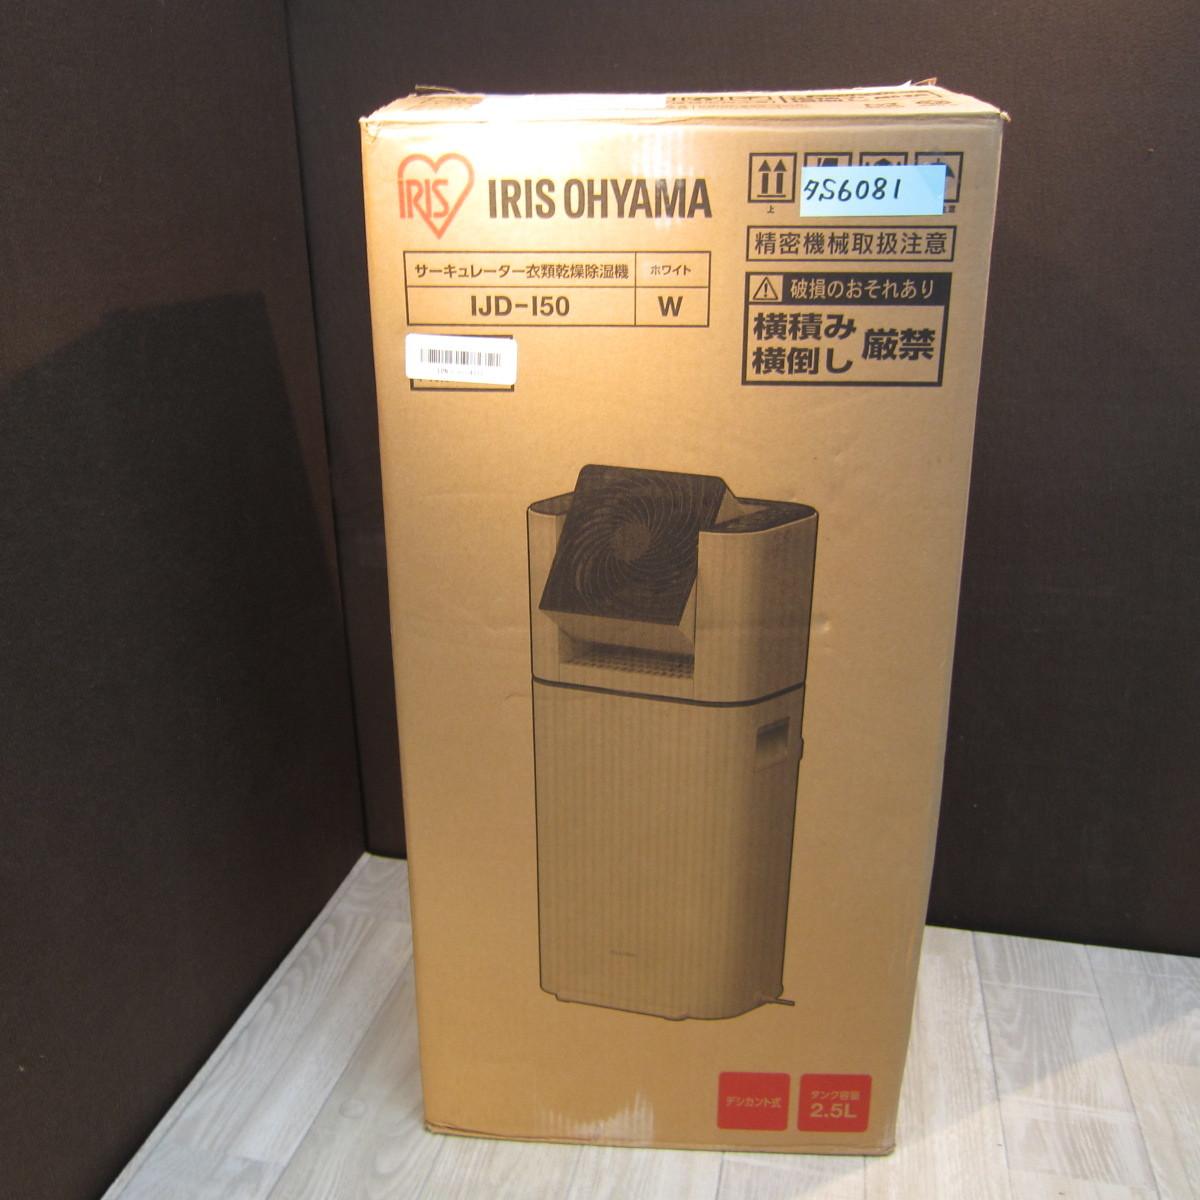 S6081【未使用】アイリスオーヤマ 衣類乾燥除湿機 スピード乾燥 サーキュレーター機能付 デシカント式 ホワイト IJD-I50_画像10